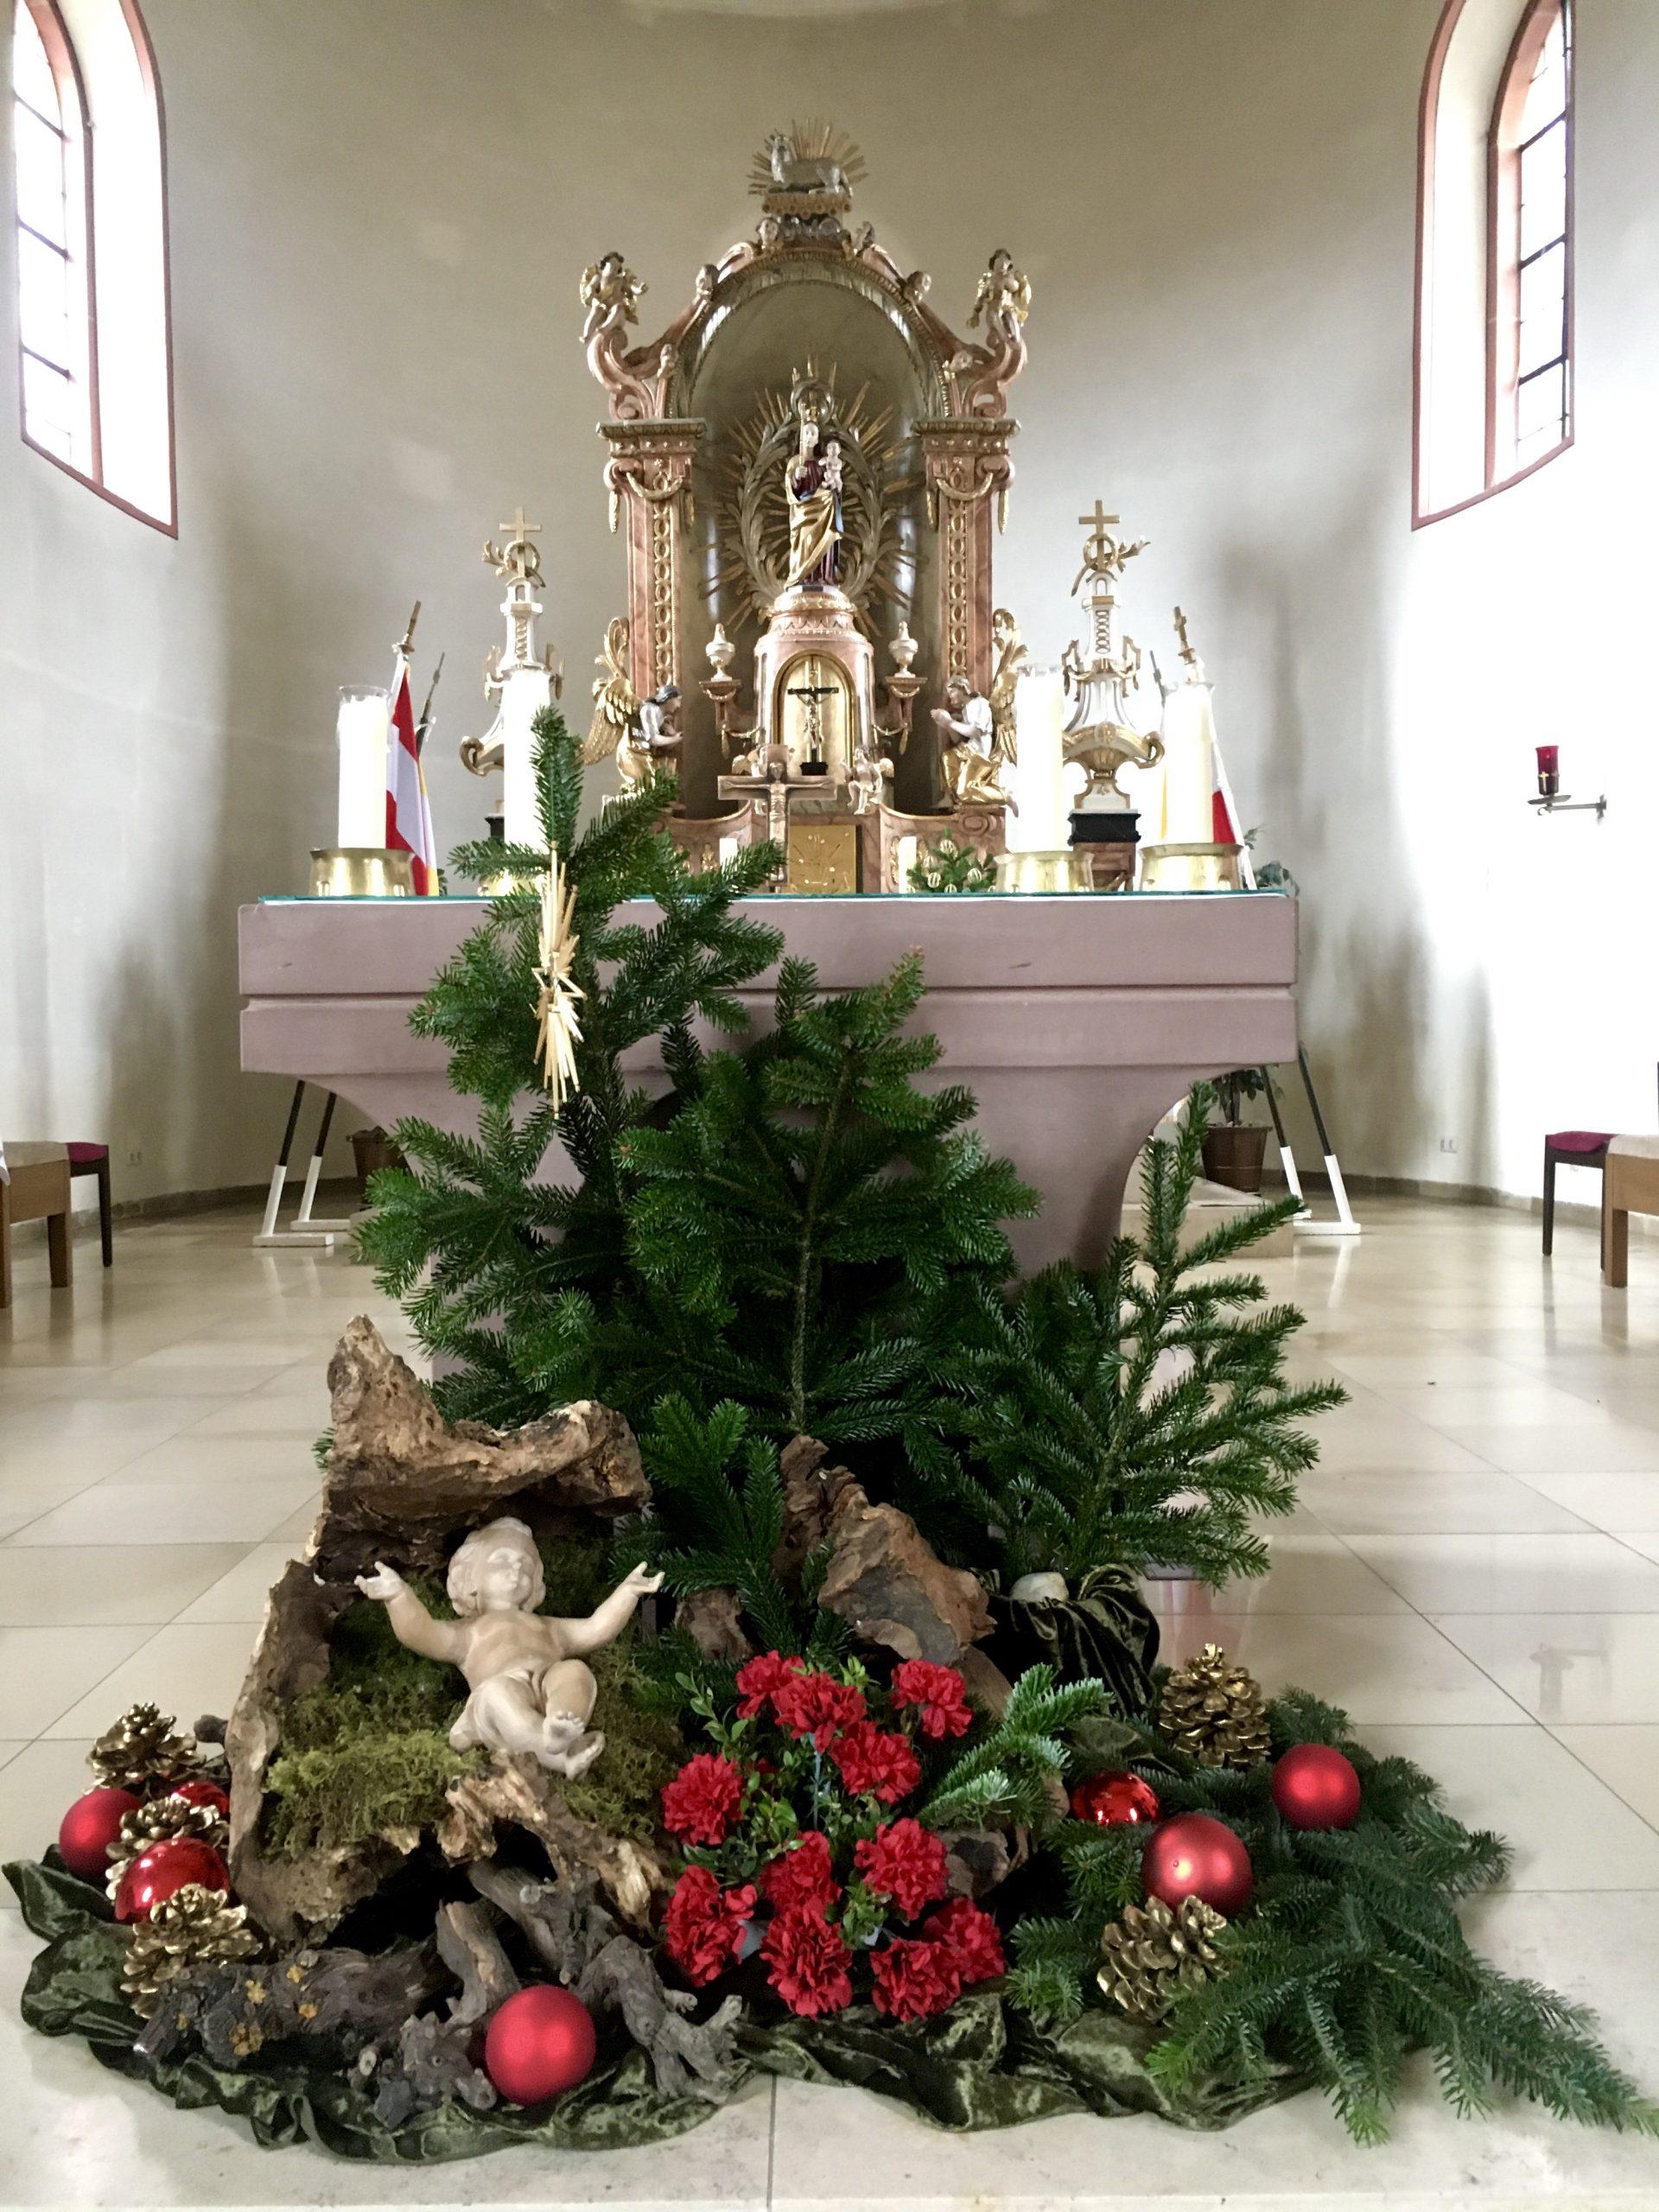 St. Michael - Zimmern